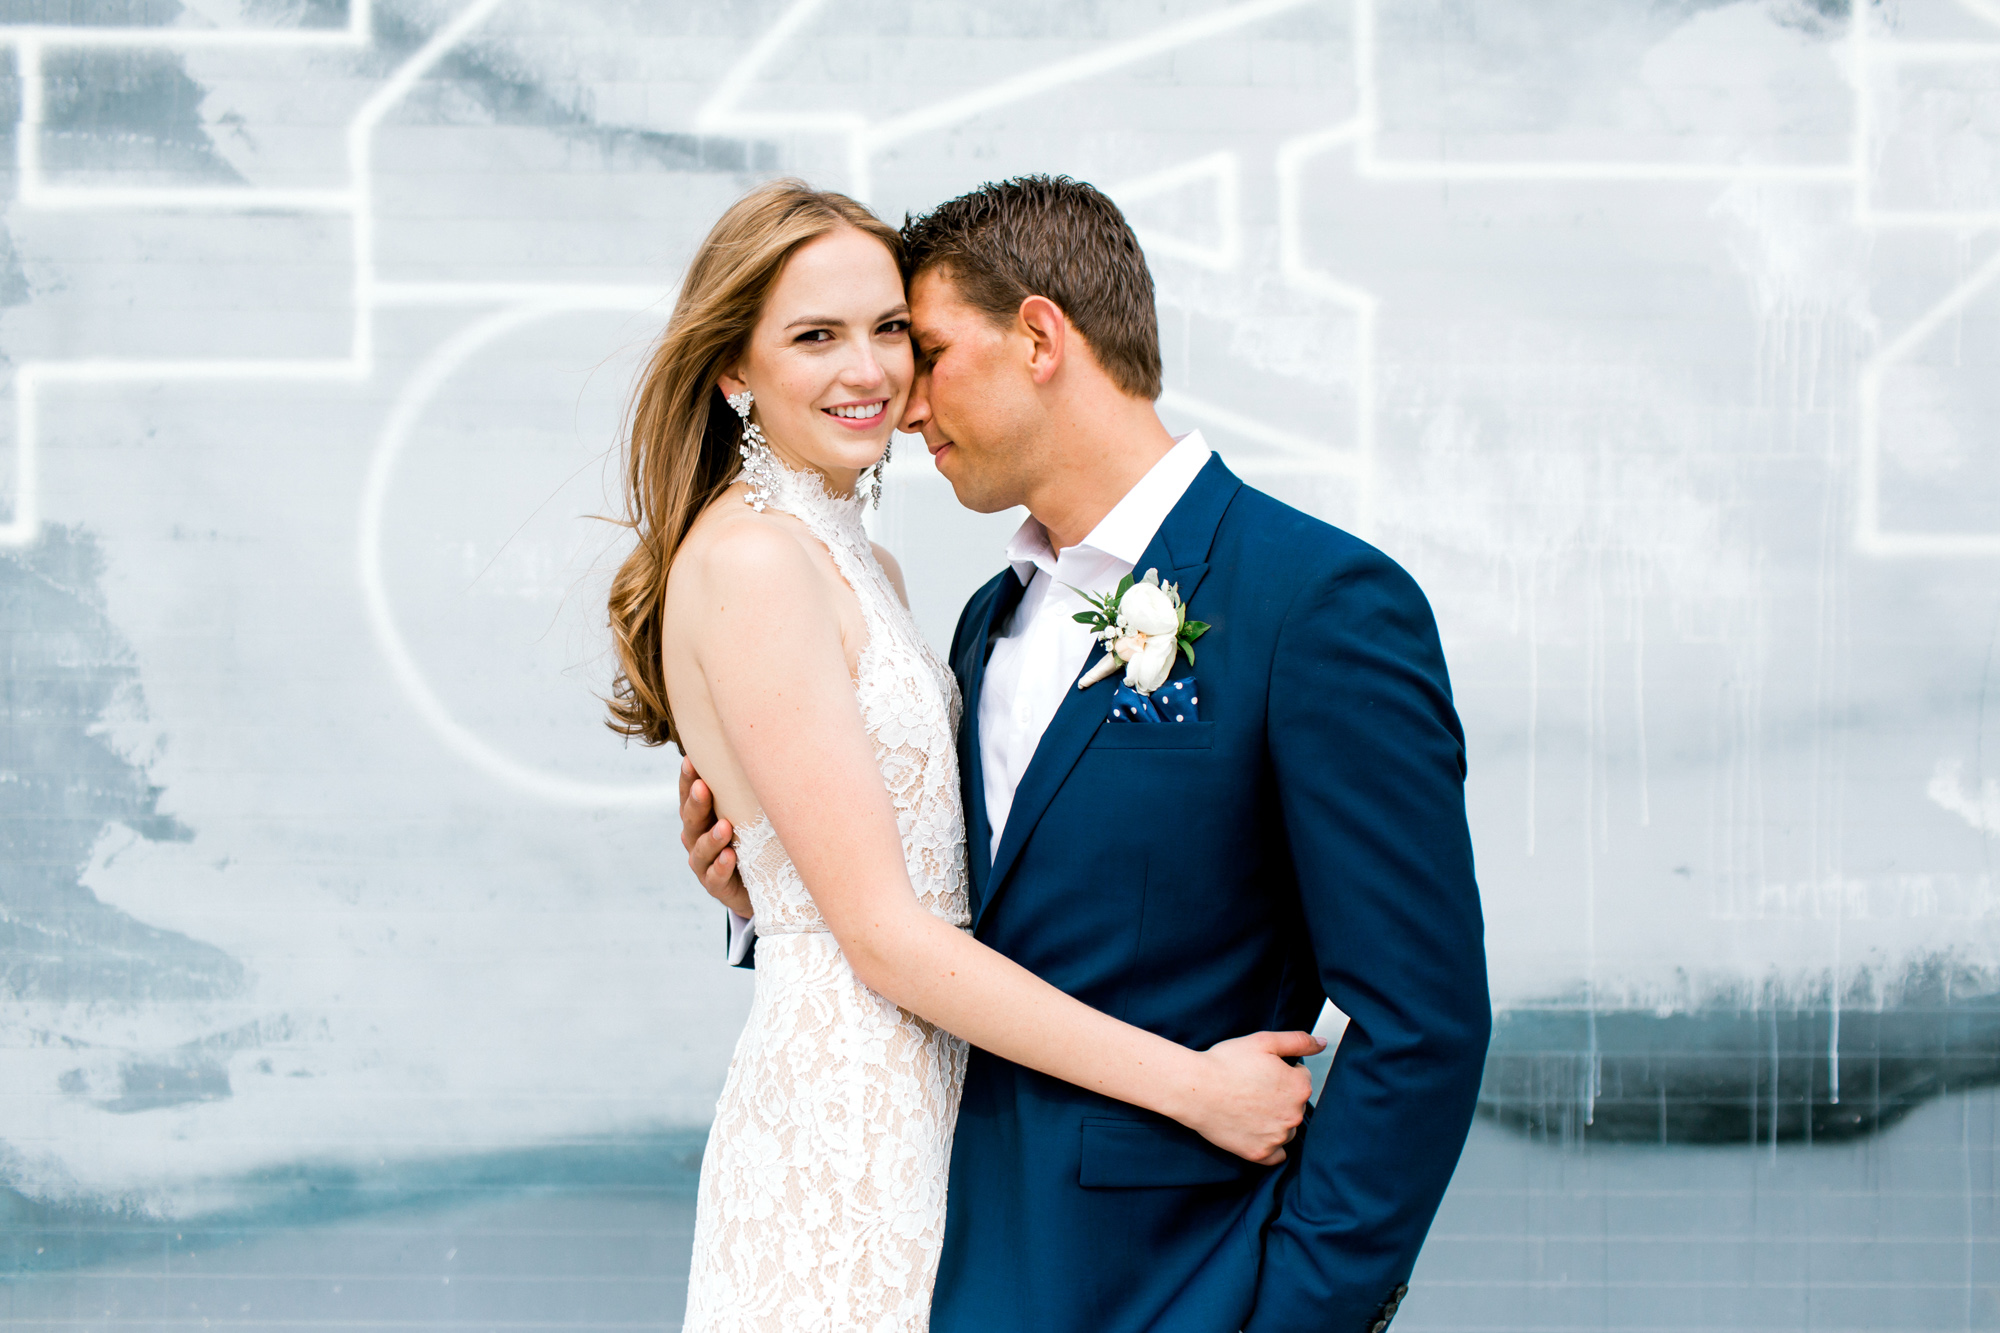 03_1896_Studio_Stages_Wedding_Brooklyn_Tanya_Salazar_Photography_001.jpg